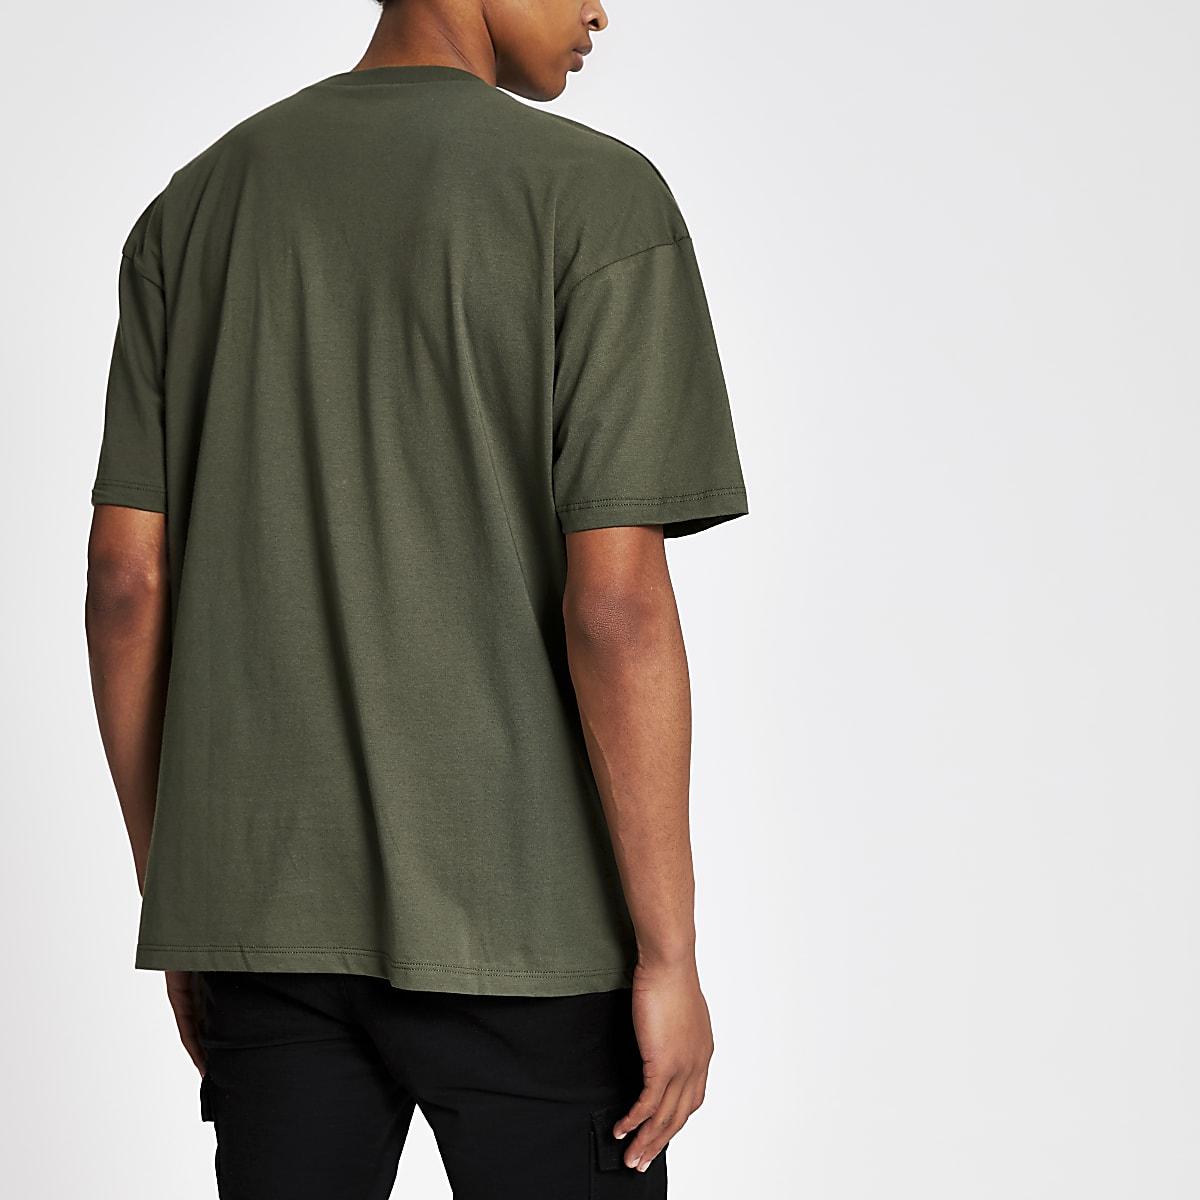 890c1e3c107 Dark green oversized short sleeve T-shirt